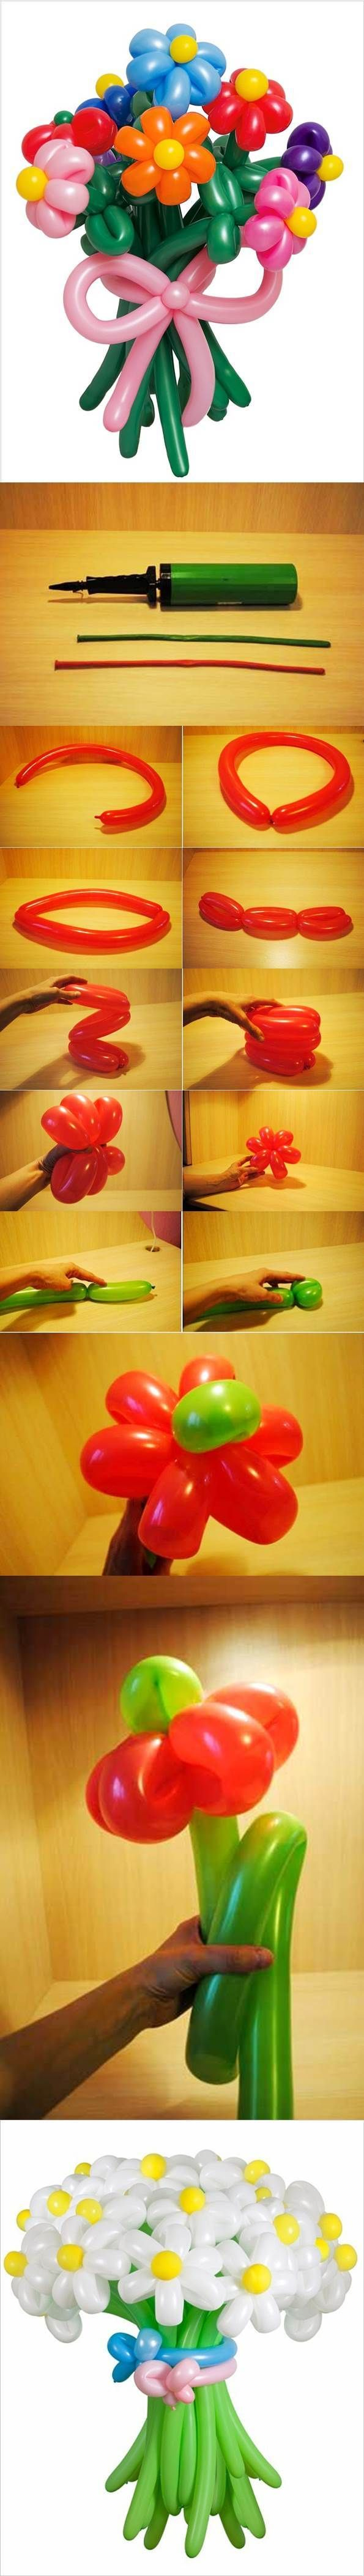 DIY Balloon Flowers